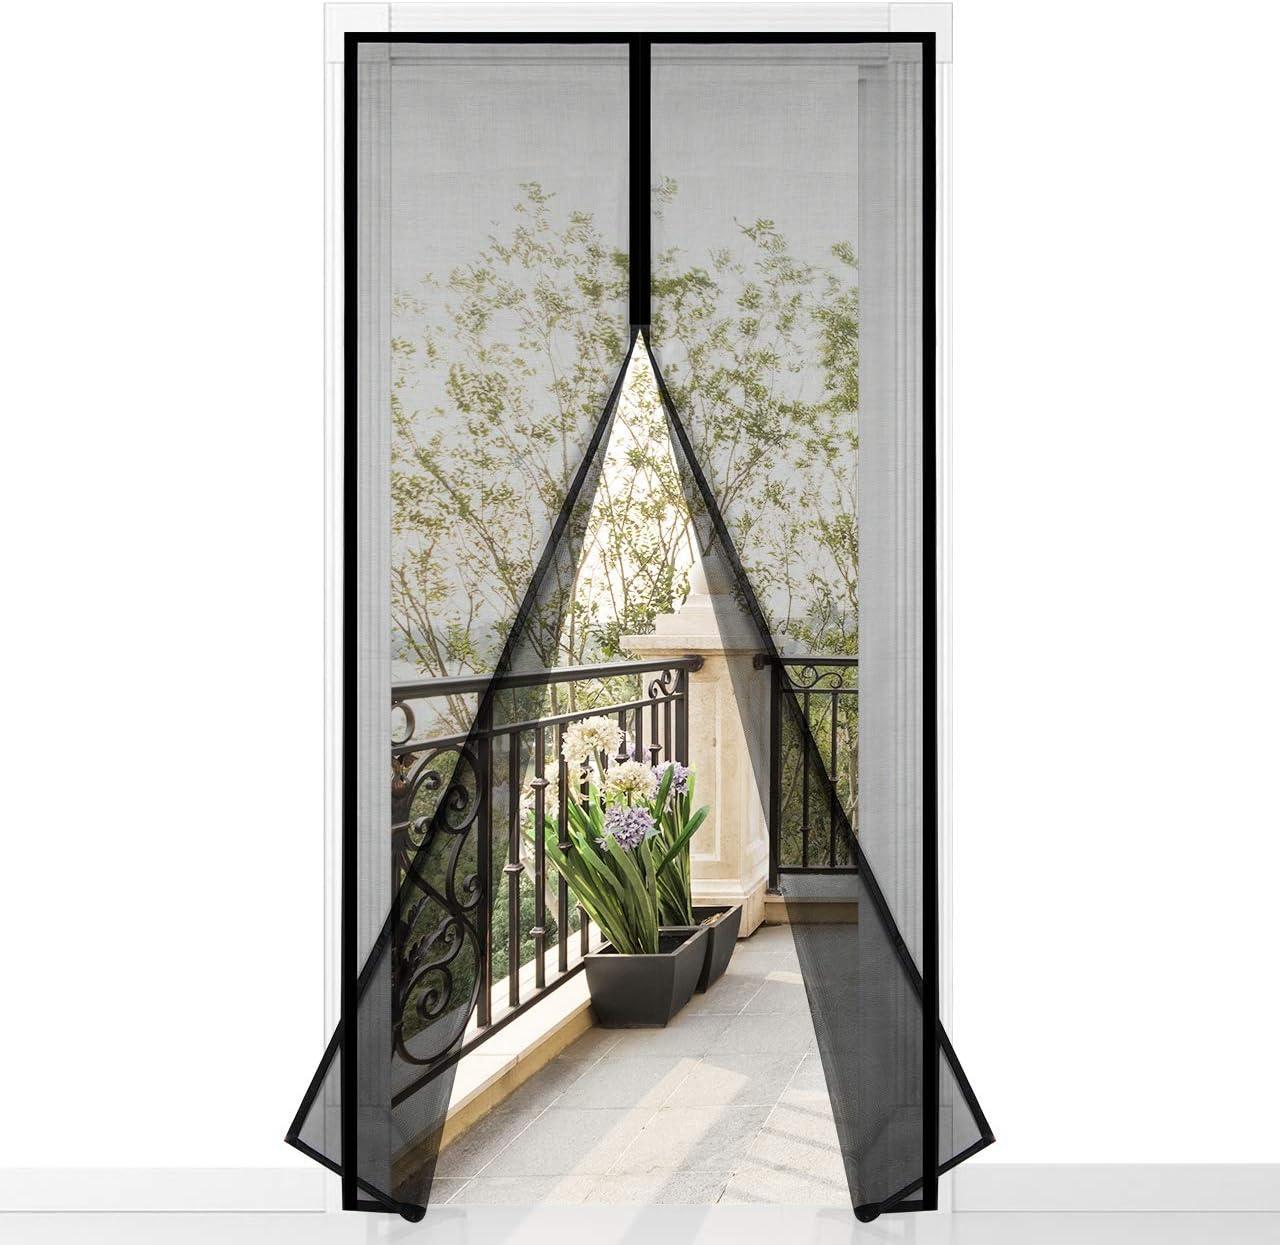 Mit Heavy Duty Mesh-Vorhang Bildschirm T/üren Fliegen Automatisch Geschlossen Let Fresh Air In Geeignet F/ür Balkont/üren WXHHH Magnetische Fliegen Insekt Gittert/ür